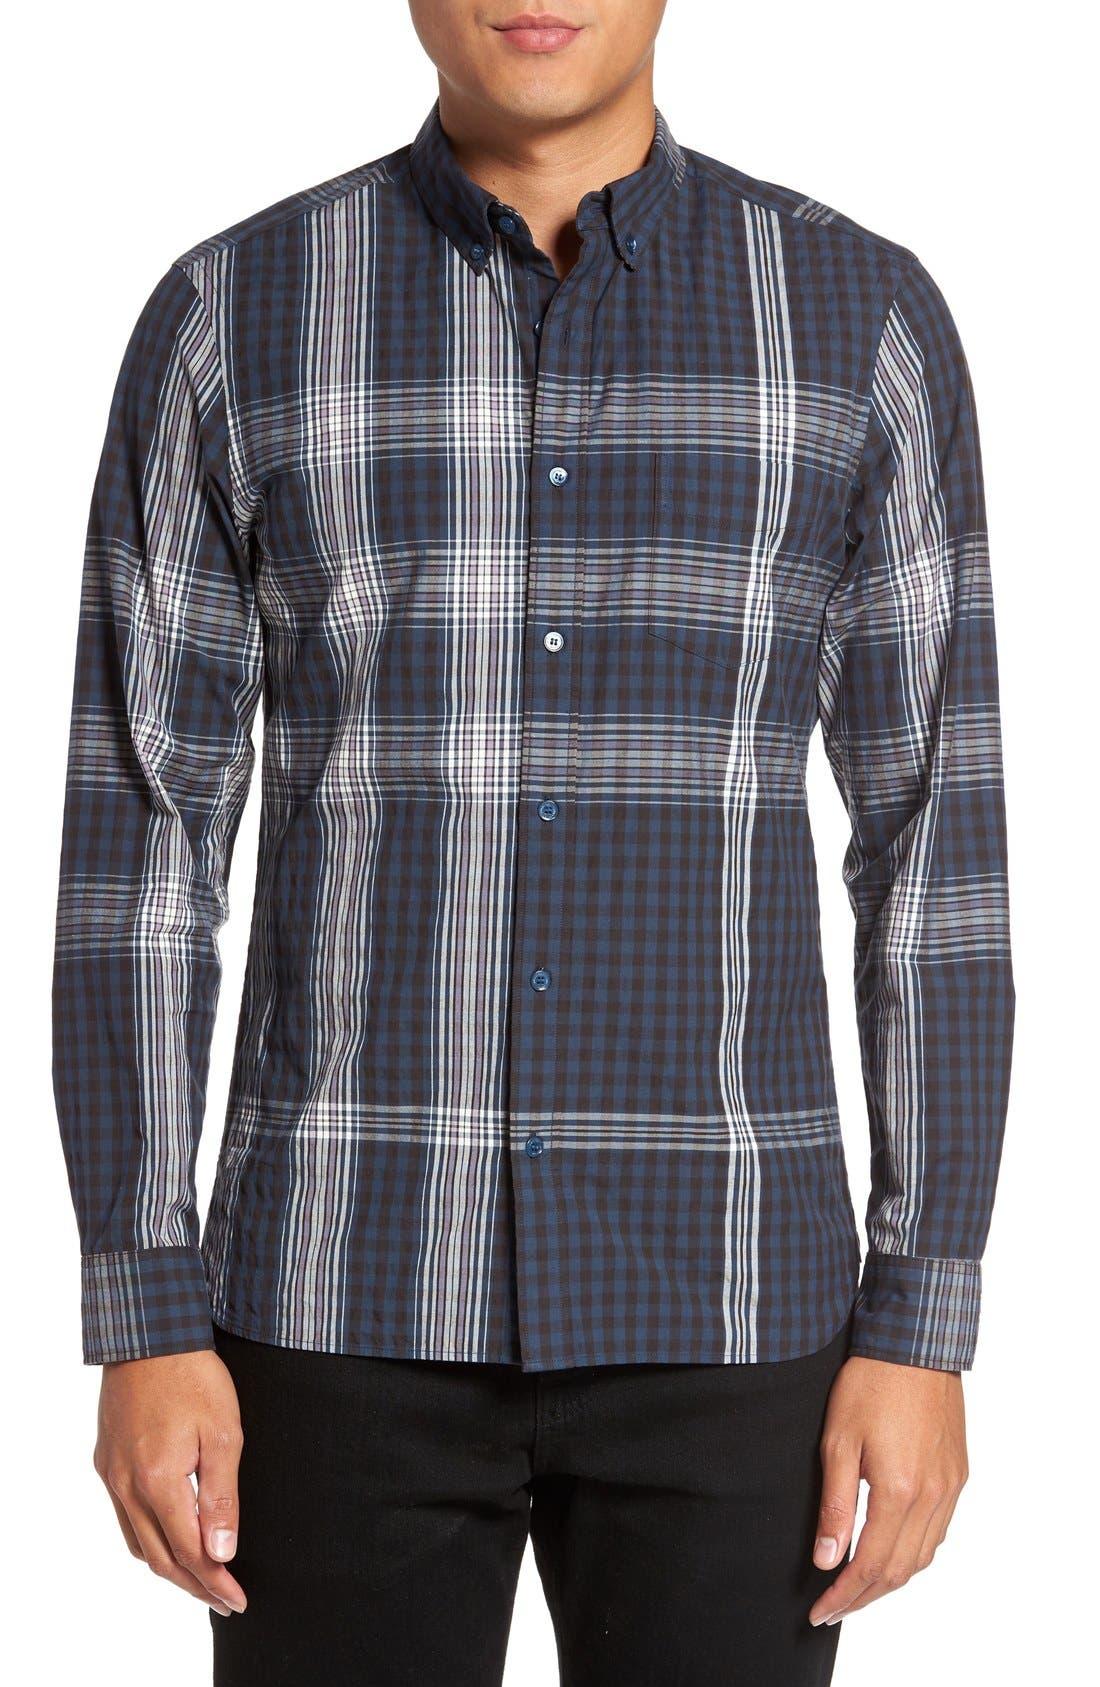 Alternate Image 1 Selected - Burberry 'Blackrock' Trim Fit Plaid Sport Shirt